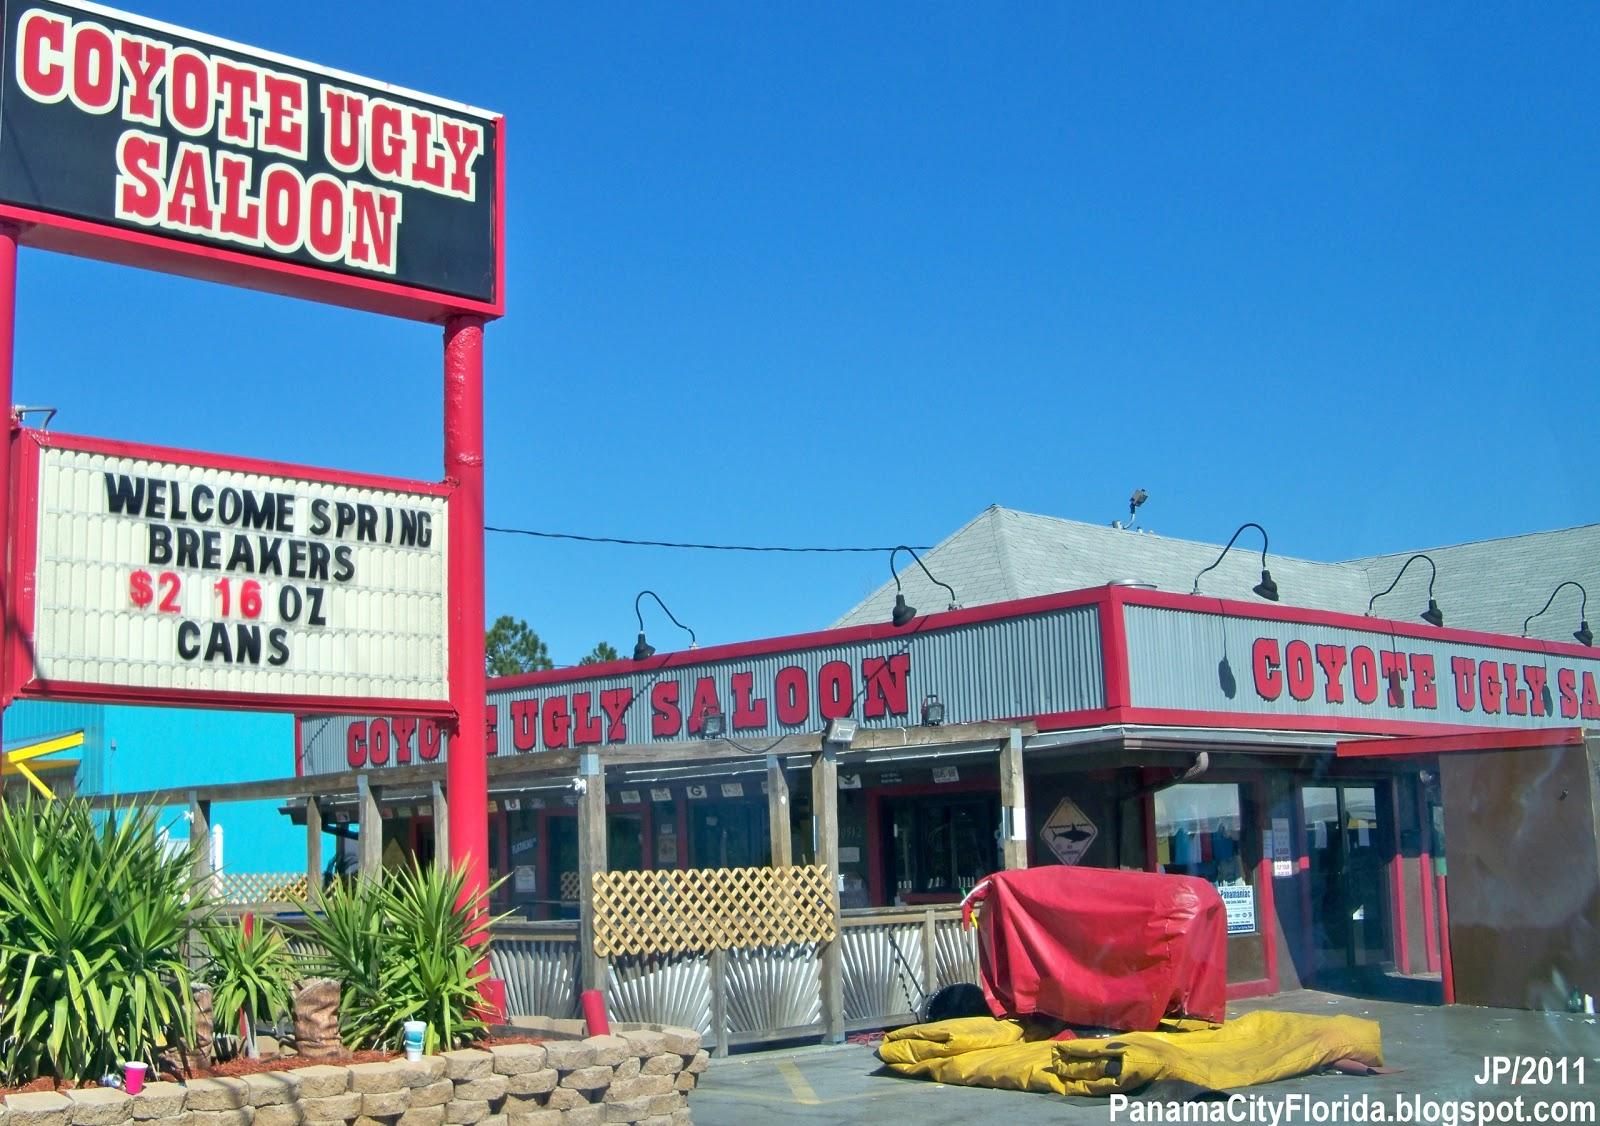 Furniture stores panama city beach fl - Coyote Ugly Saloon Panama City Beach Florida Front Beach Road Coyote Ugly Saloon Bar Panama City Beach Fl